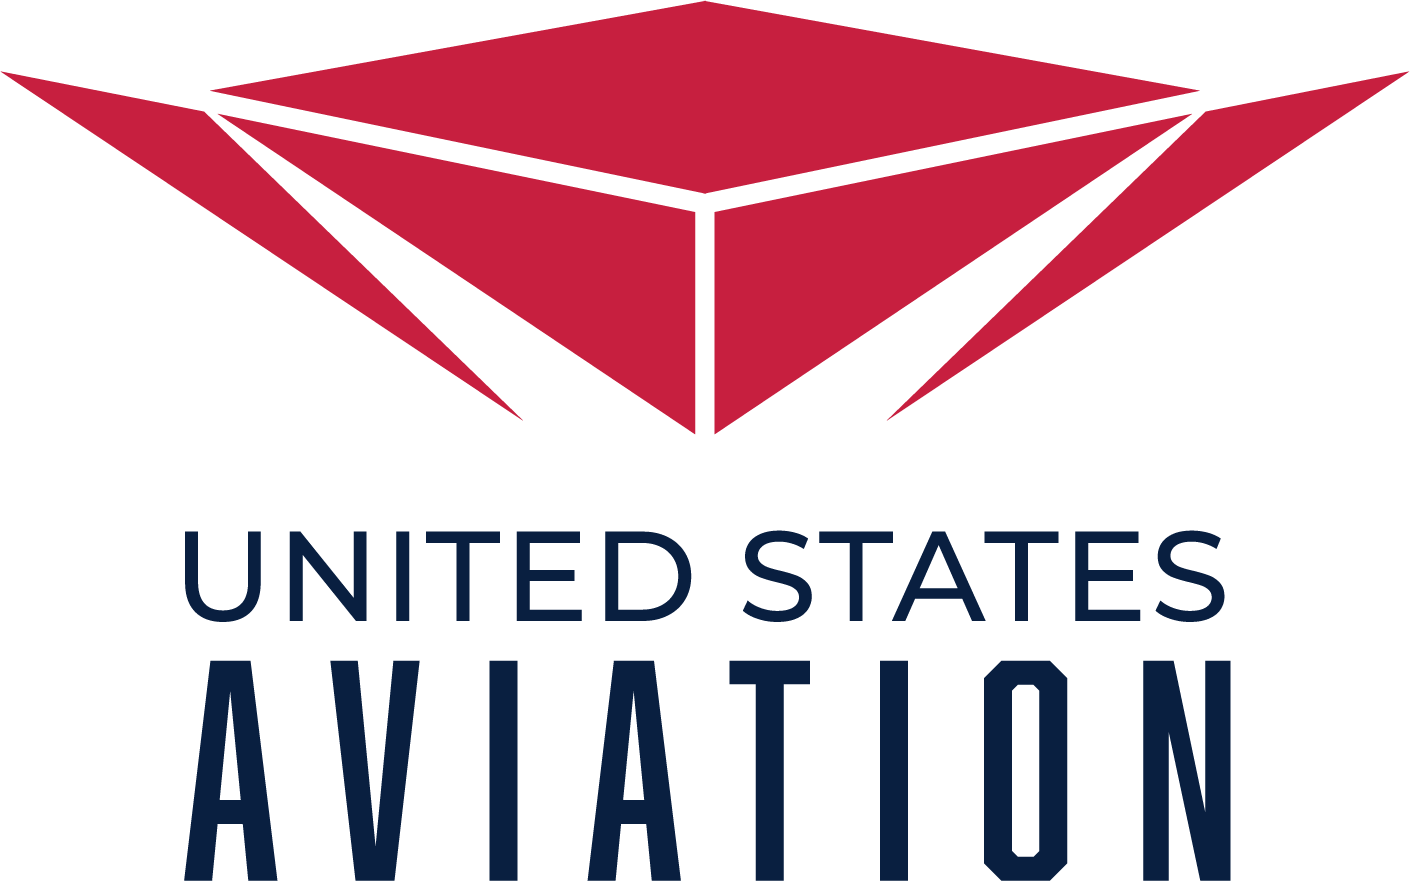 United States Aviation